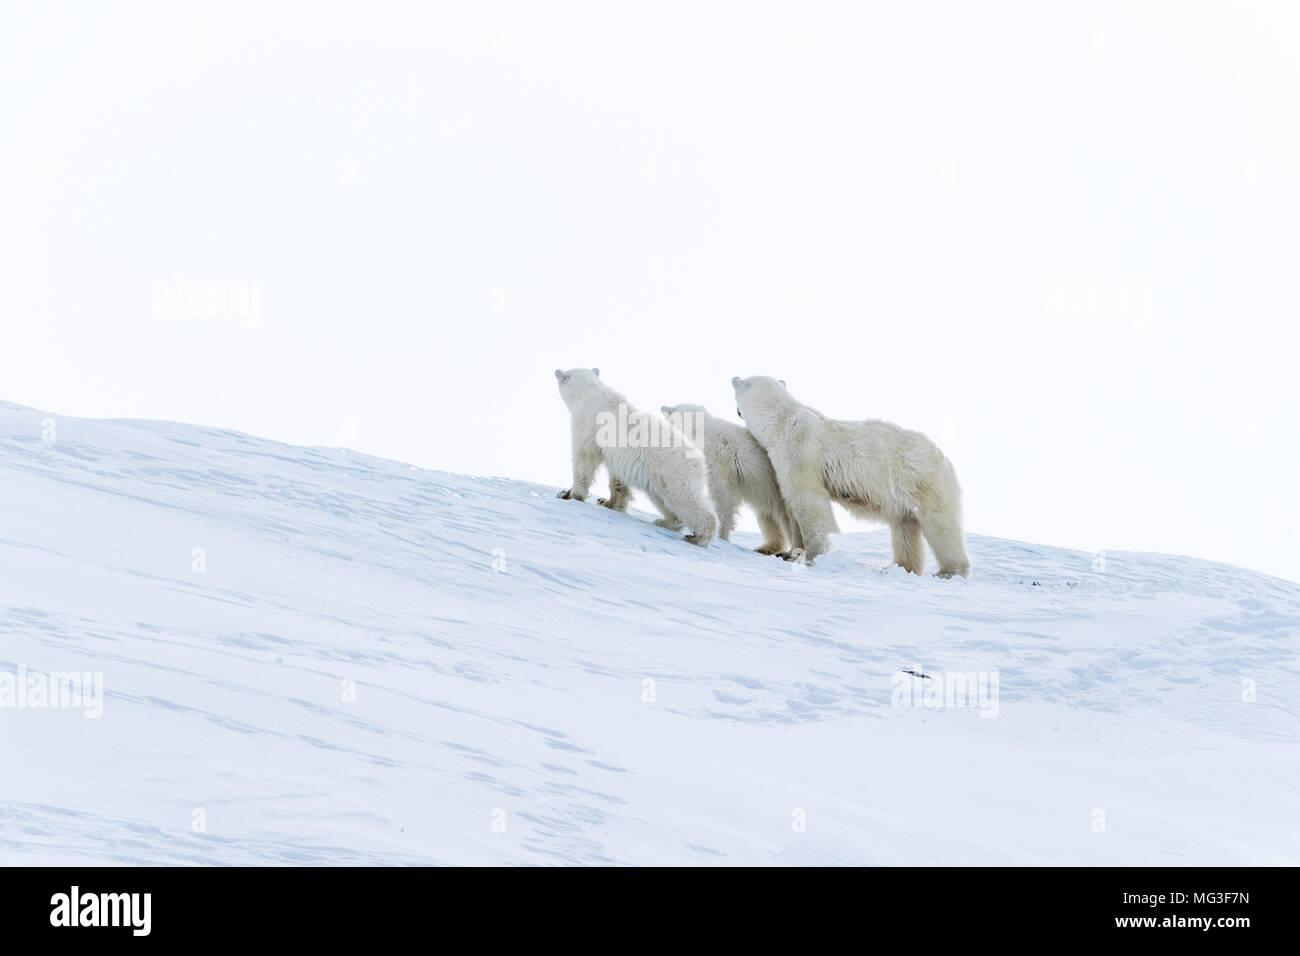 Mother polar bear and a yearling cub walking on an iceberg, Baffin Island, Canada, nunavut, arctic Stock Photo